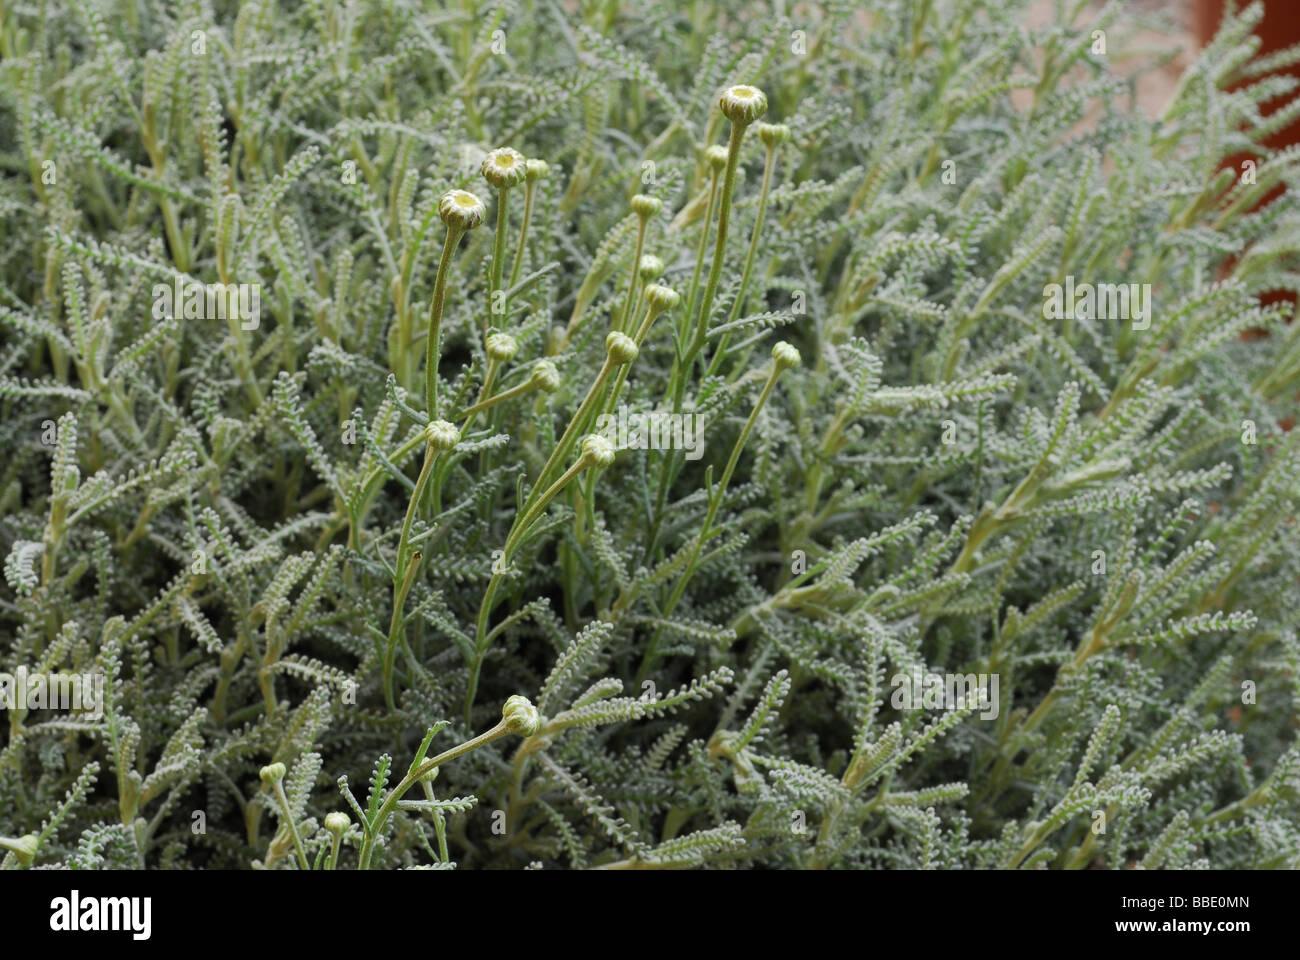 Santolina chamaecyparissus, Asteraceae - Stock Image